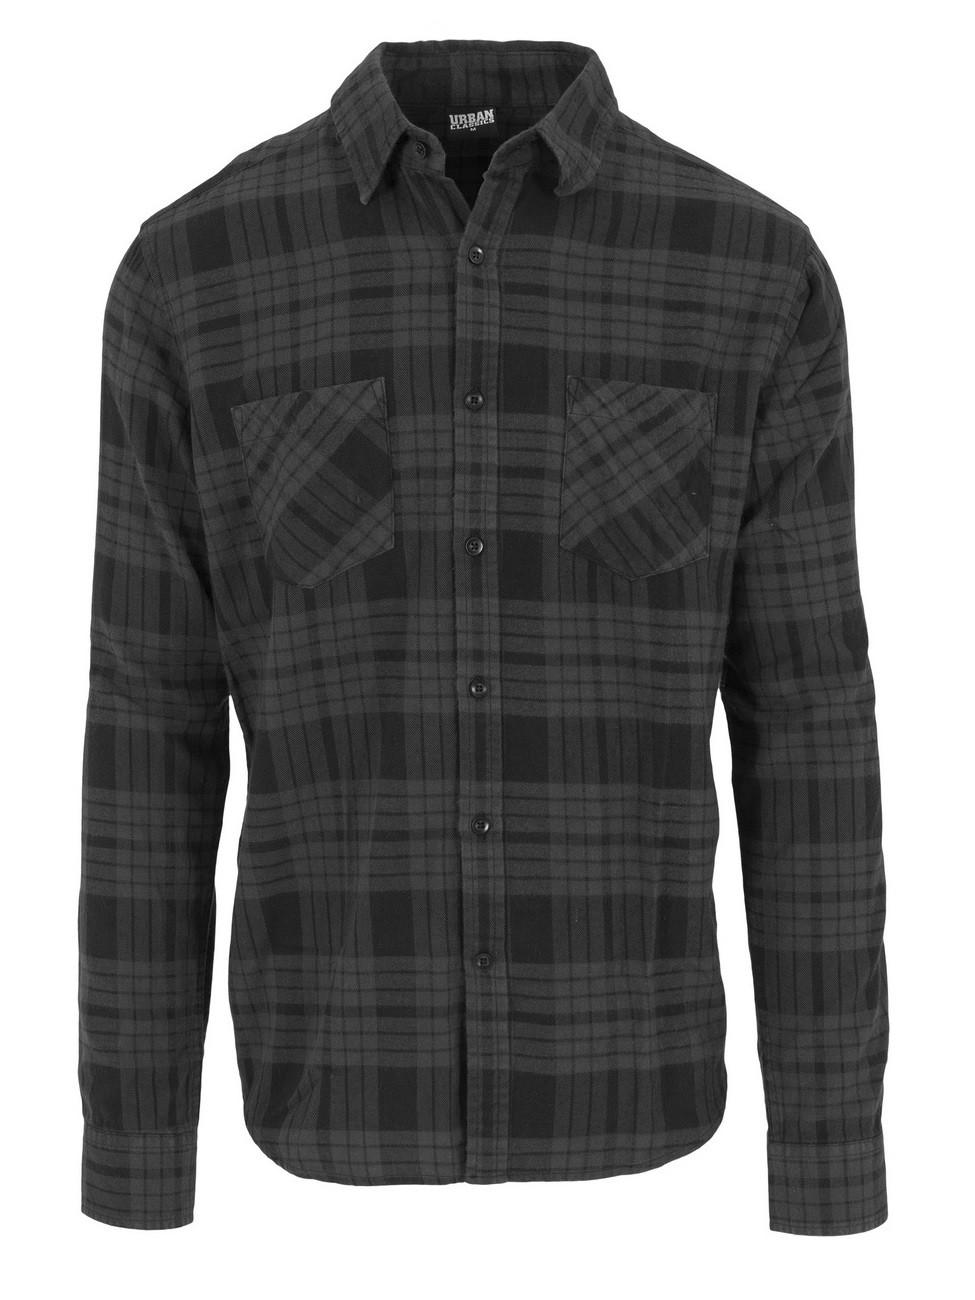 Urban Classics Herren Hemd Checked Flanell